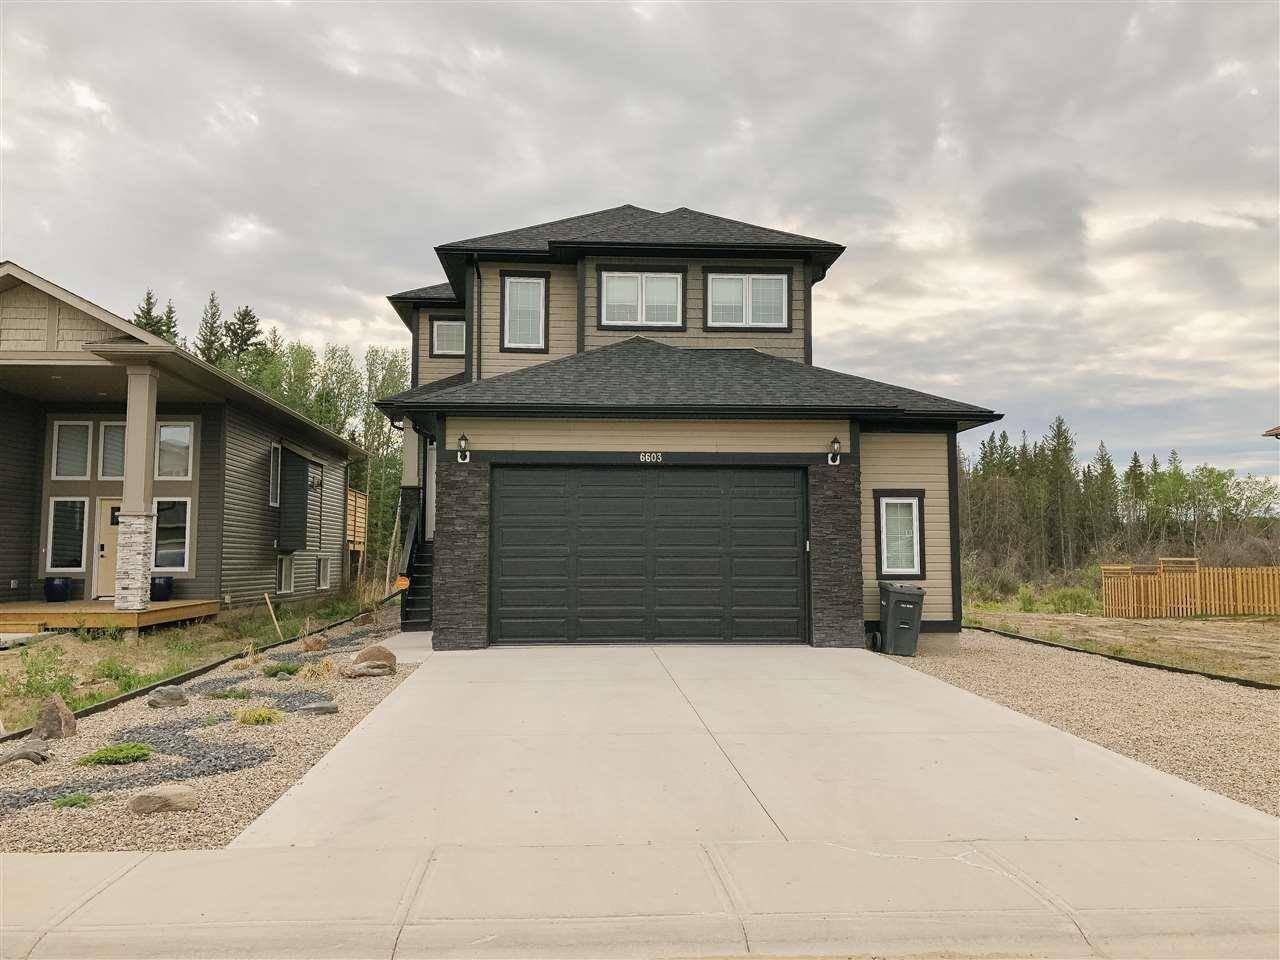 House for sale at 6603 Tri-city Wy Cold Lake Alberta - MLS: E4161169